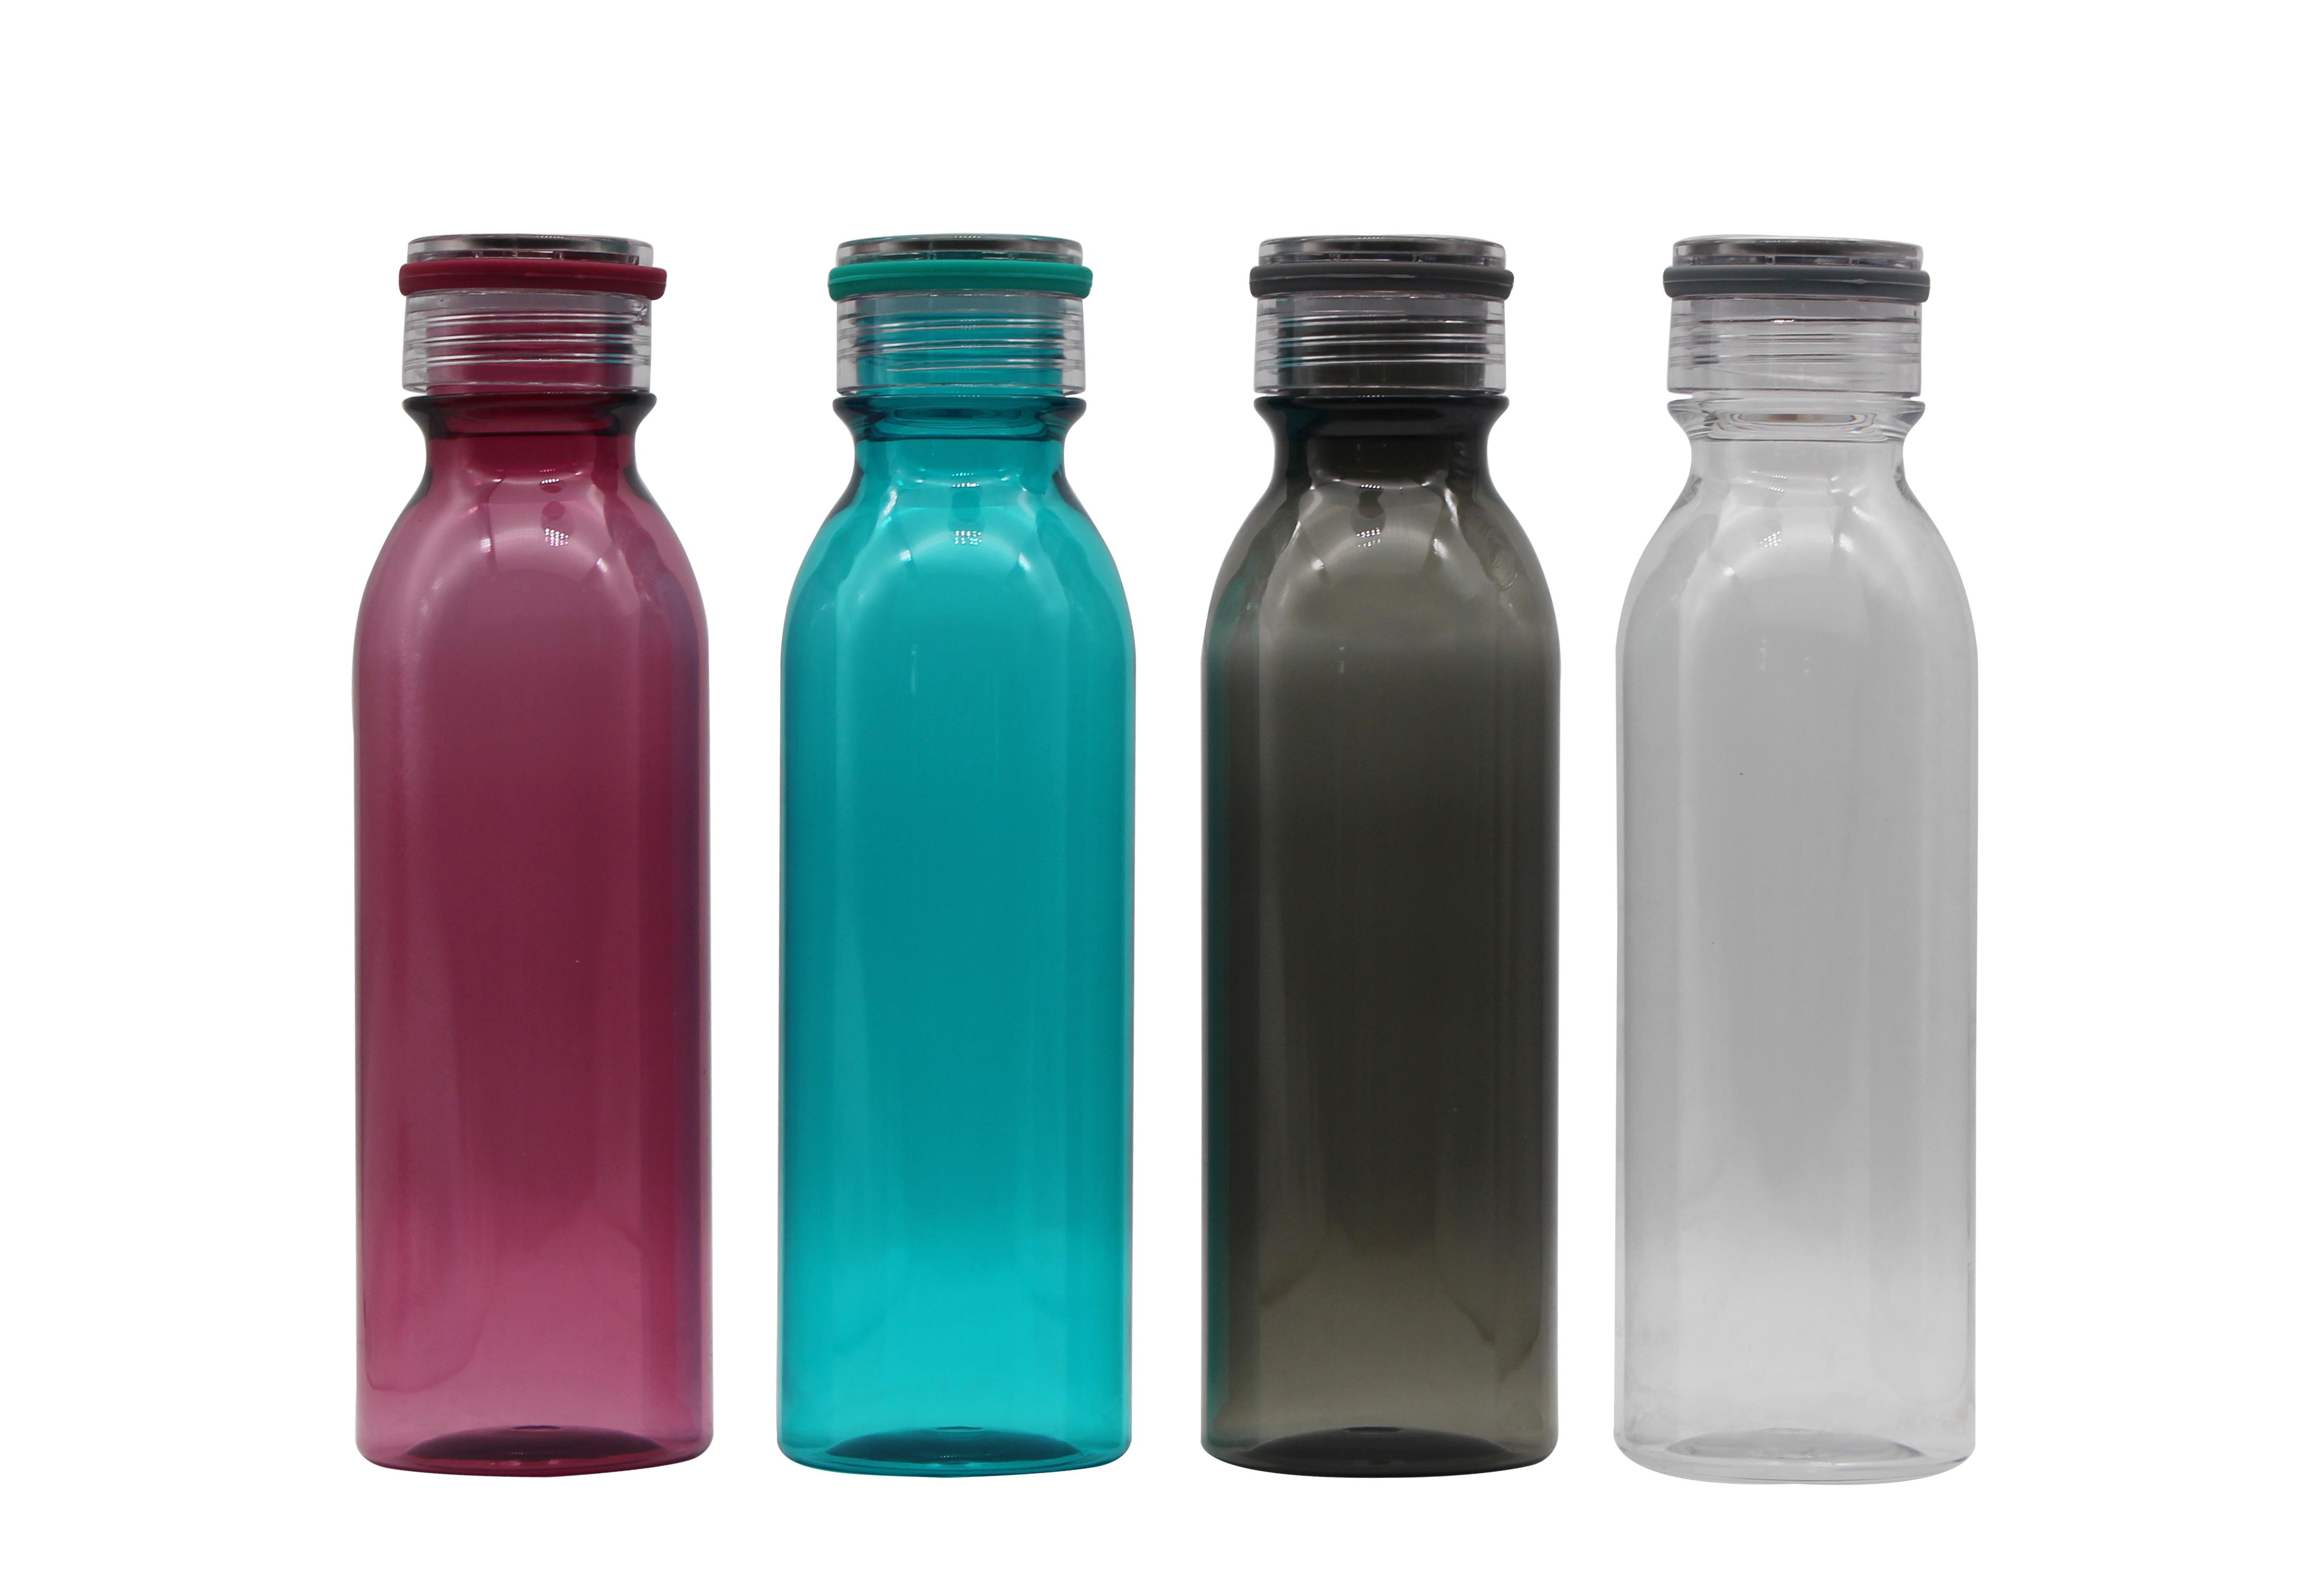 24 Oz Warna-warni Tritan Tidak Beracun Plastik Dapat Digunakan Kembali Botol Air dengan Tali Silikon